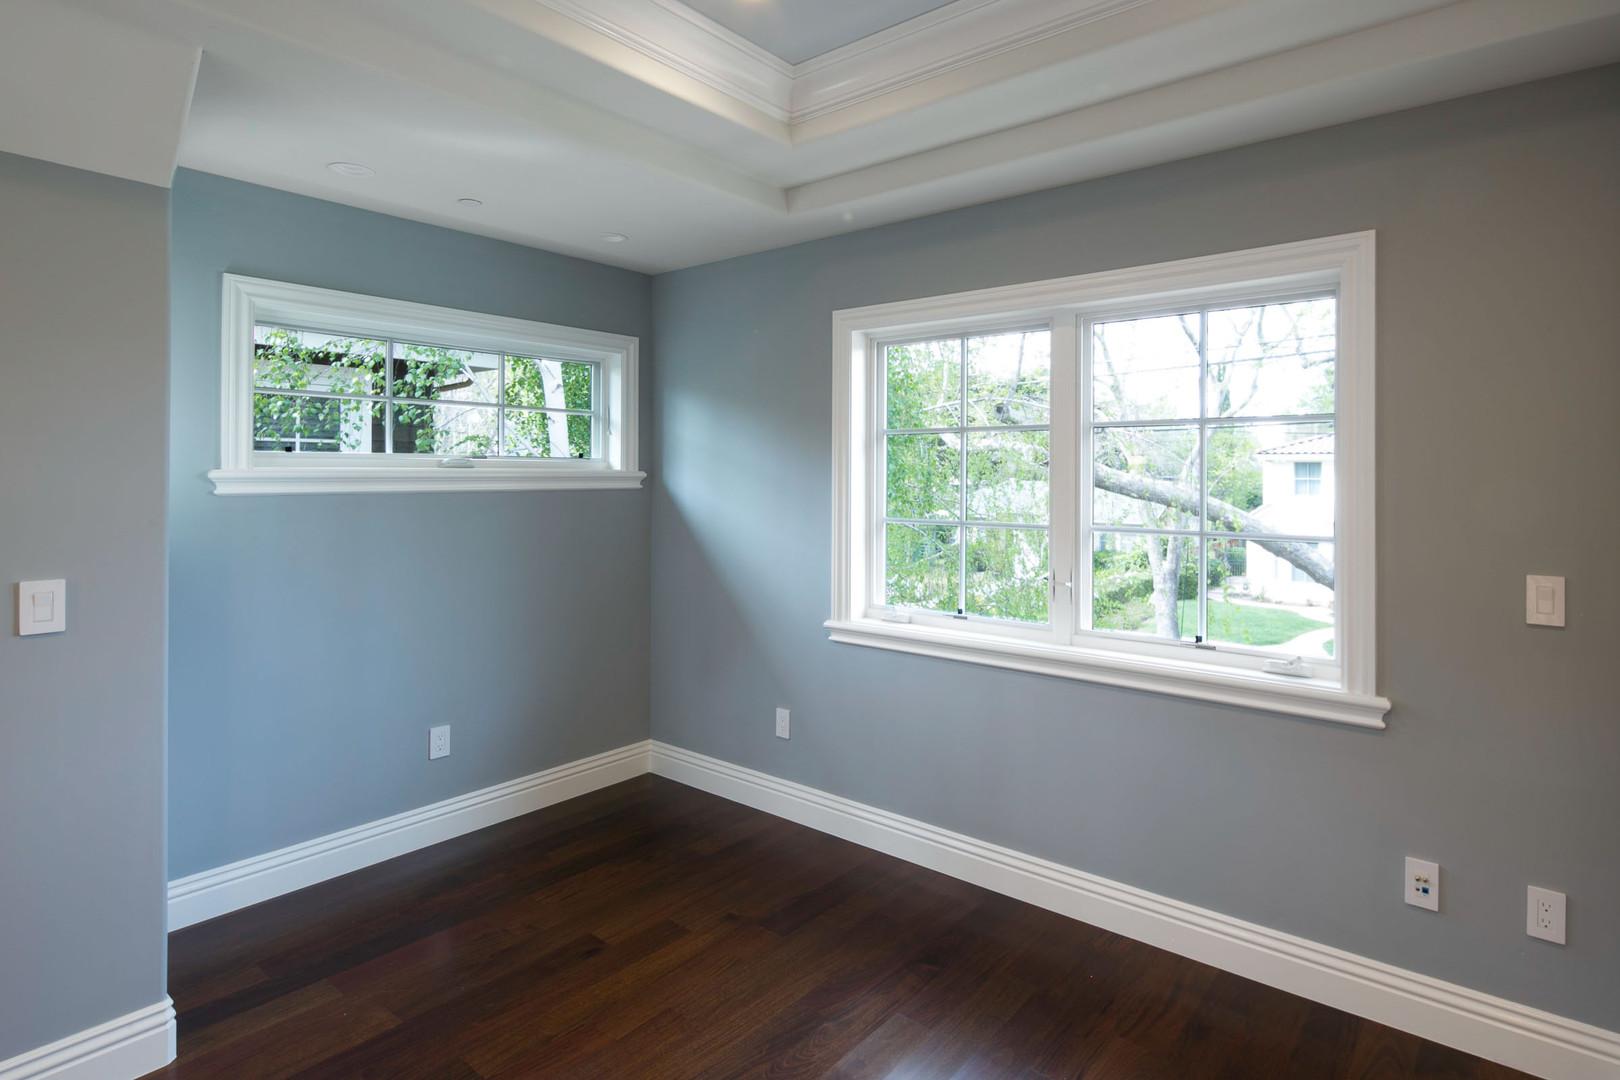 Transitional - Pine - Bedroom - 1 - Afte